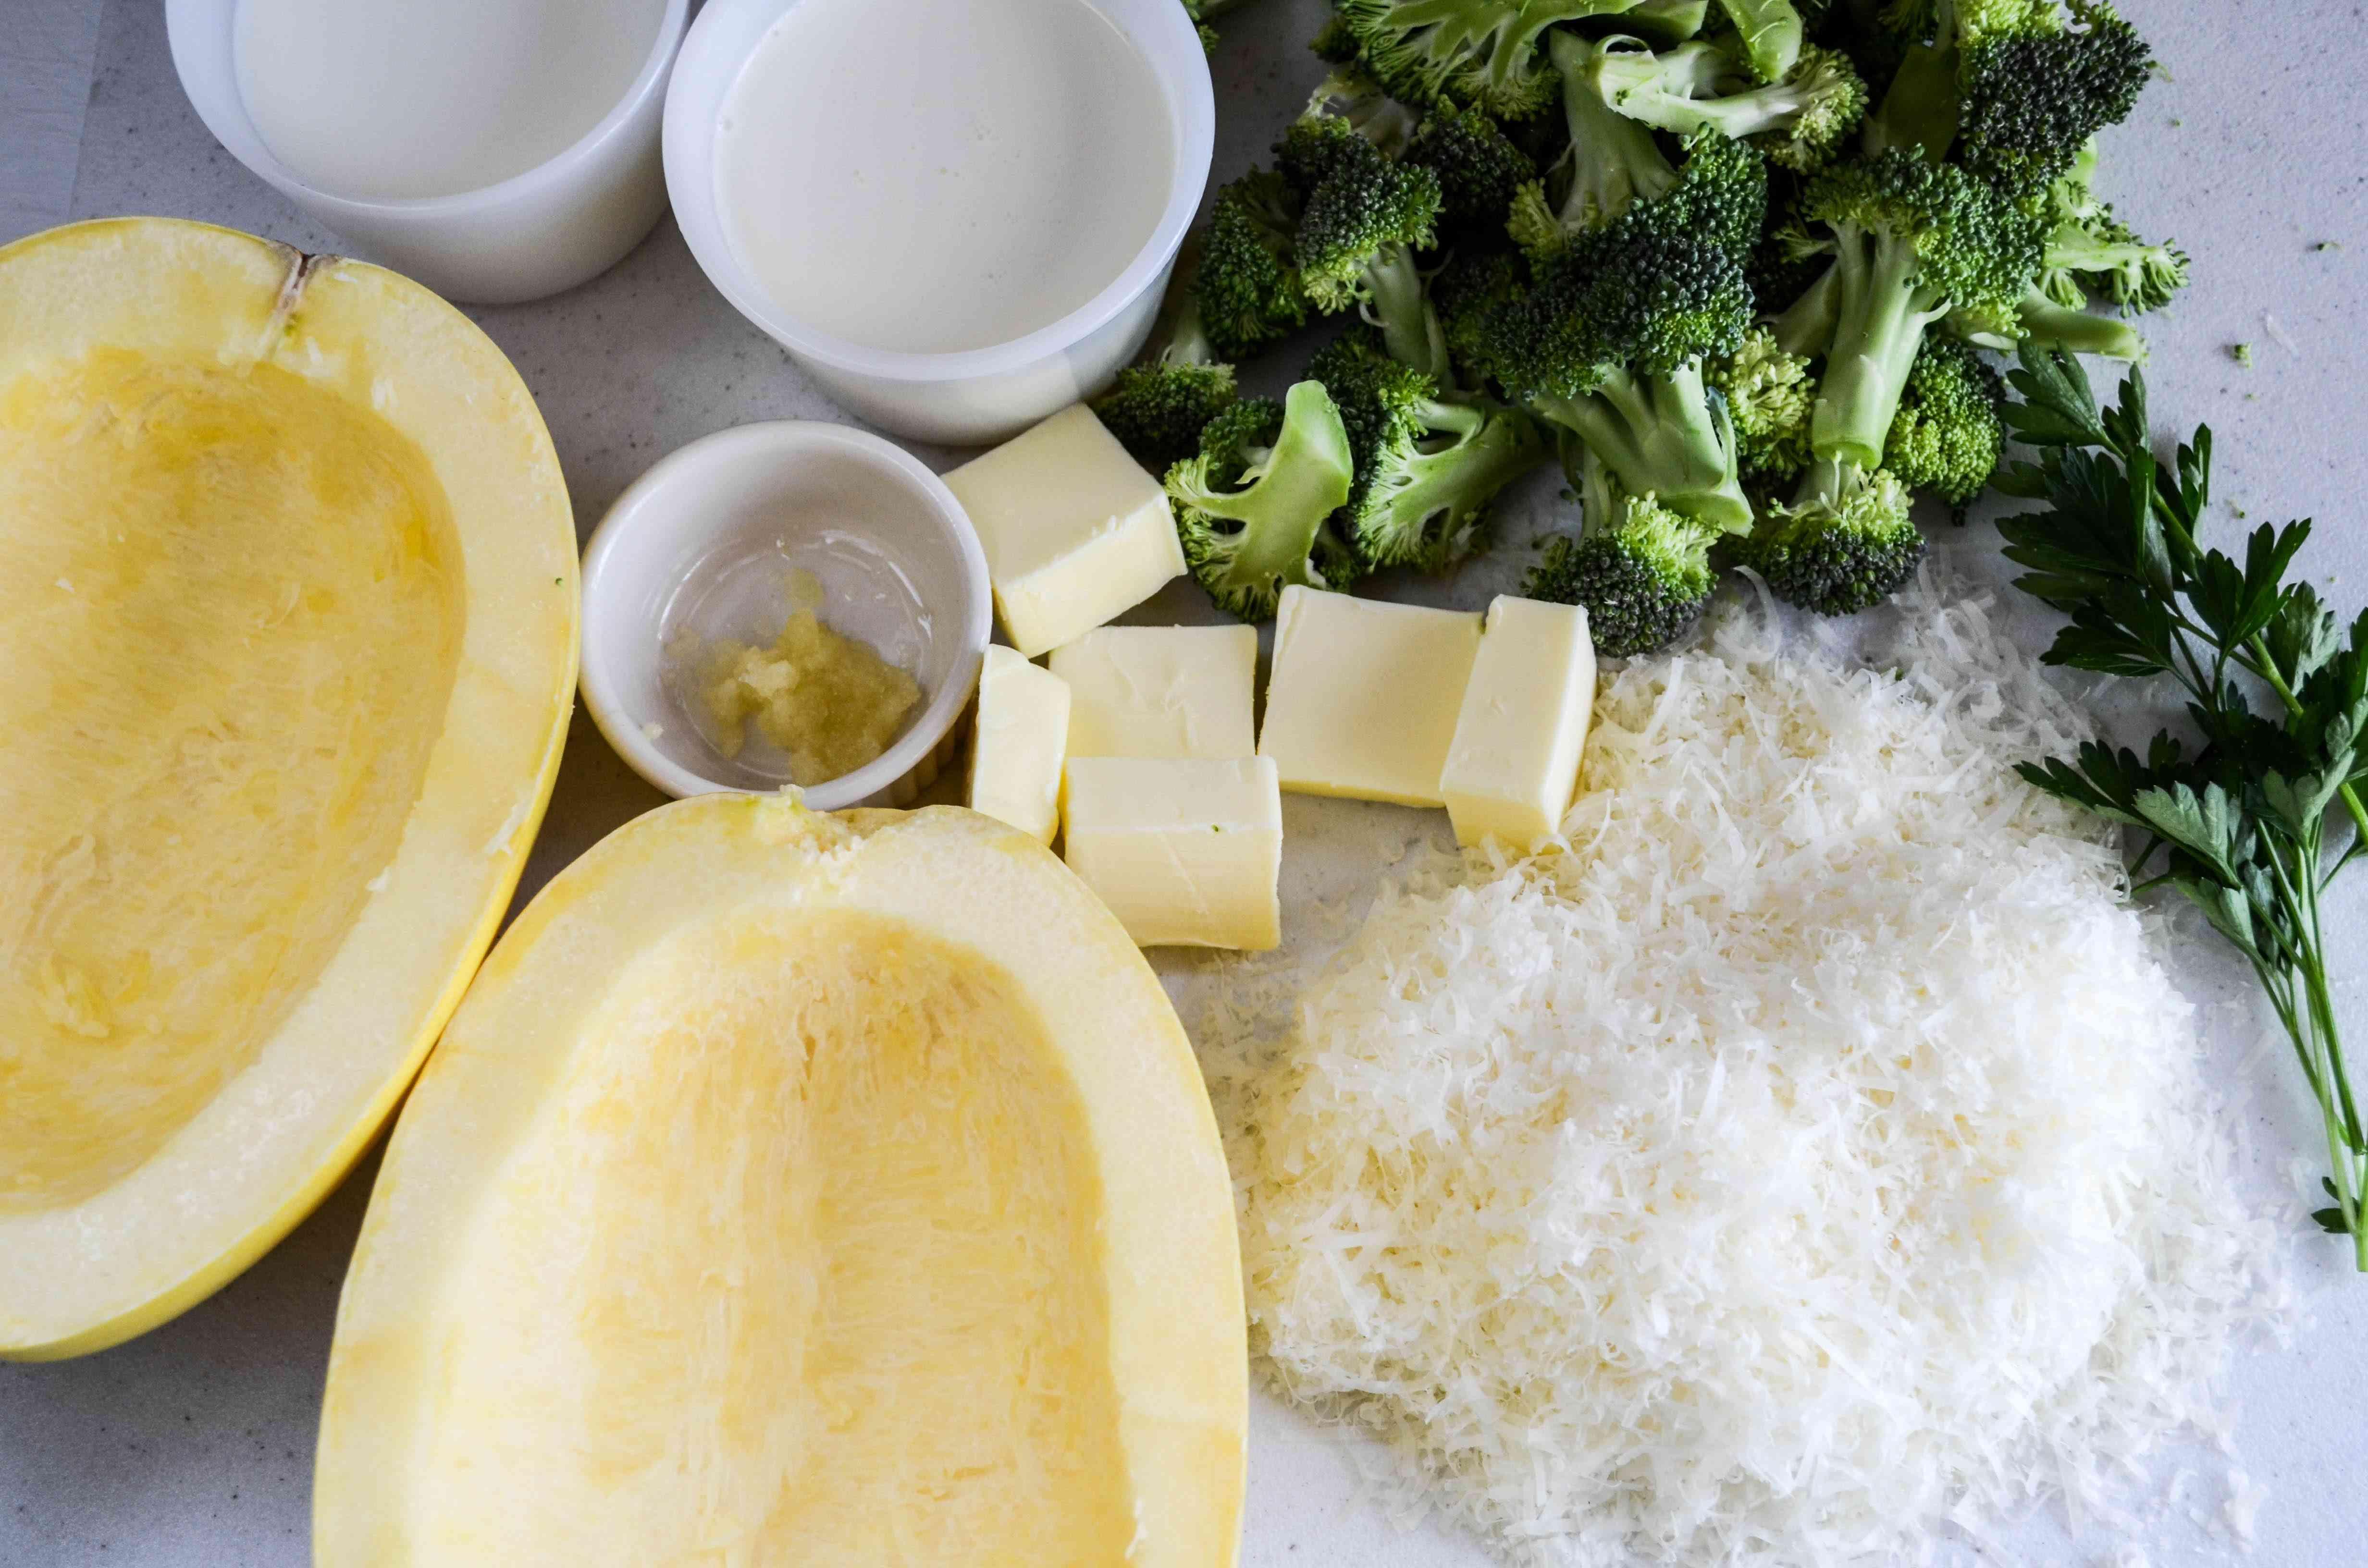 Ingredients for spaghetti squash alfredo